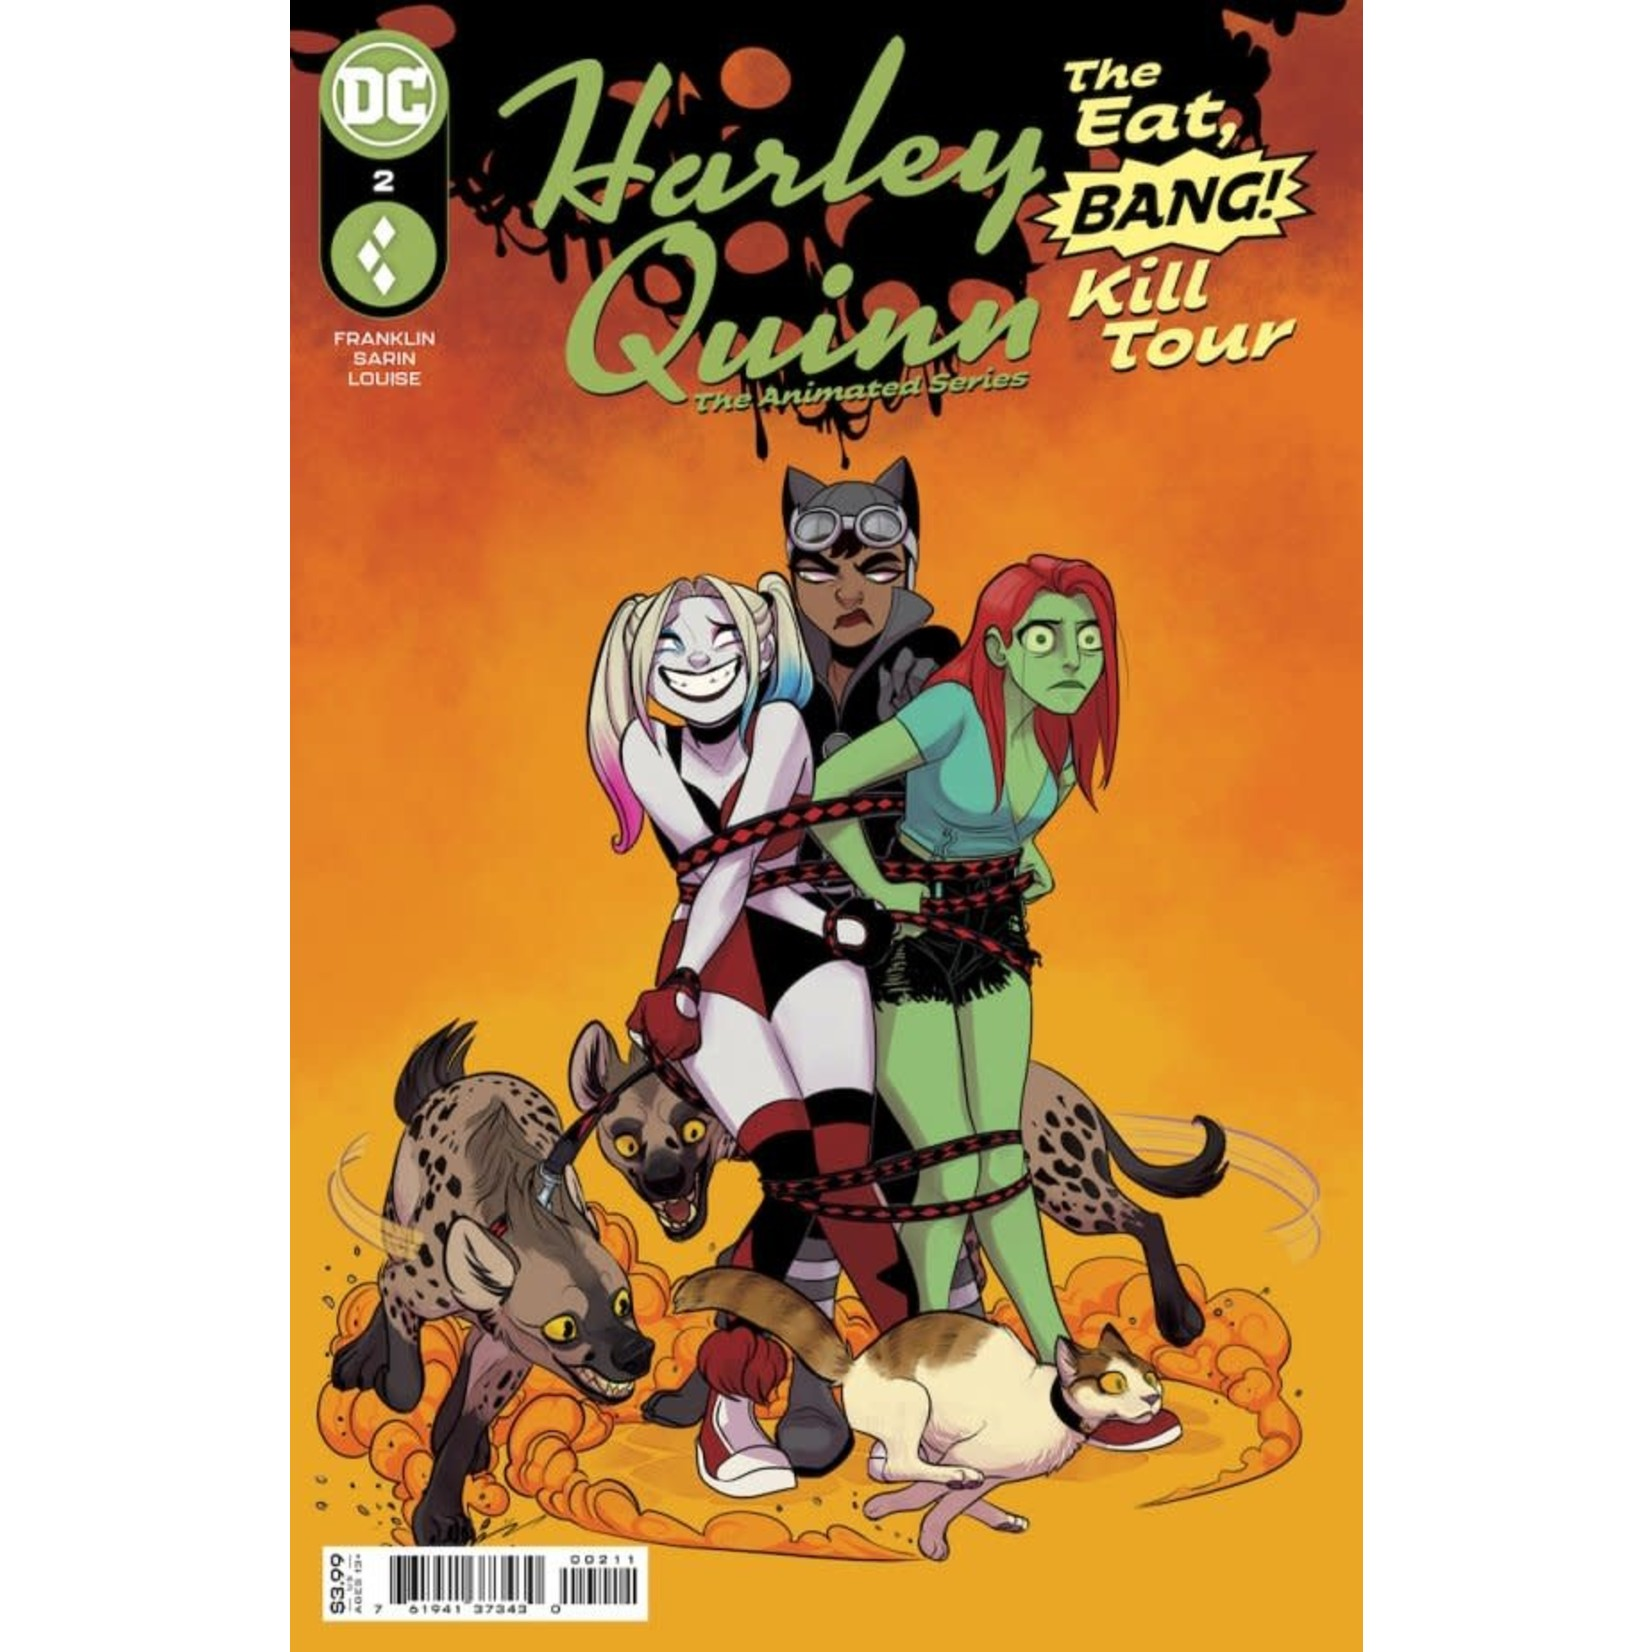 DC Comics Harley Quinn: The Animated Series - The Eat, Bang, Kill Tour #2